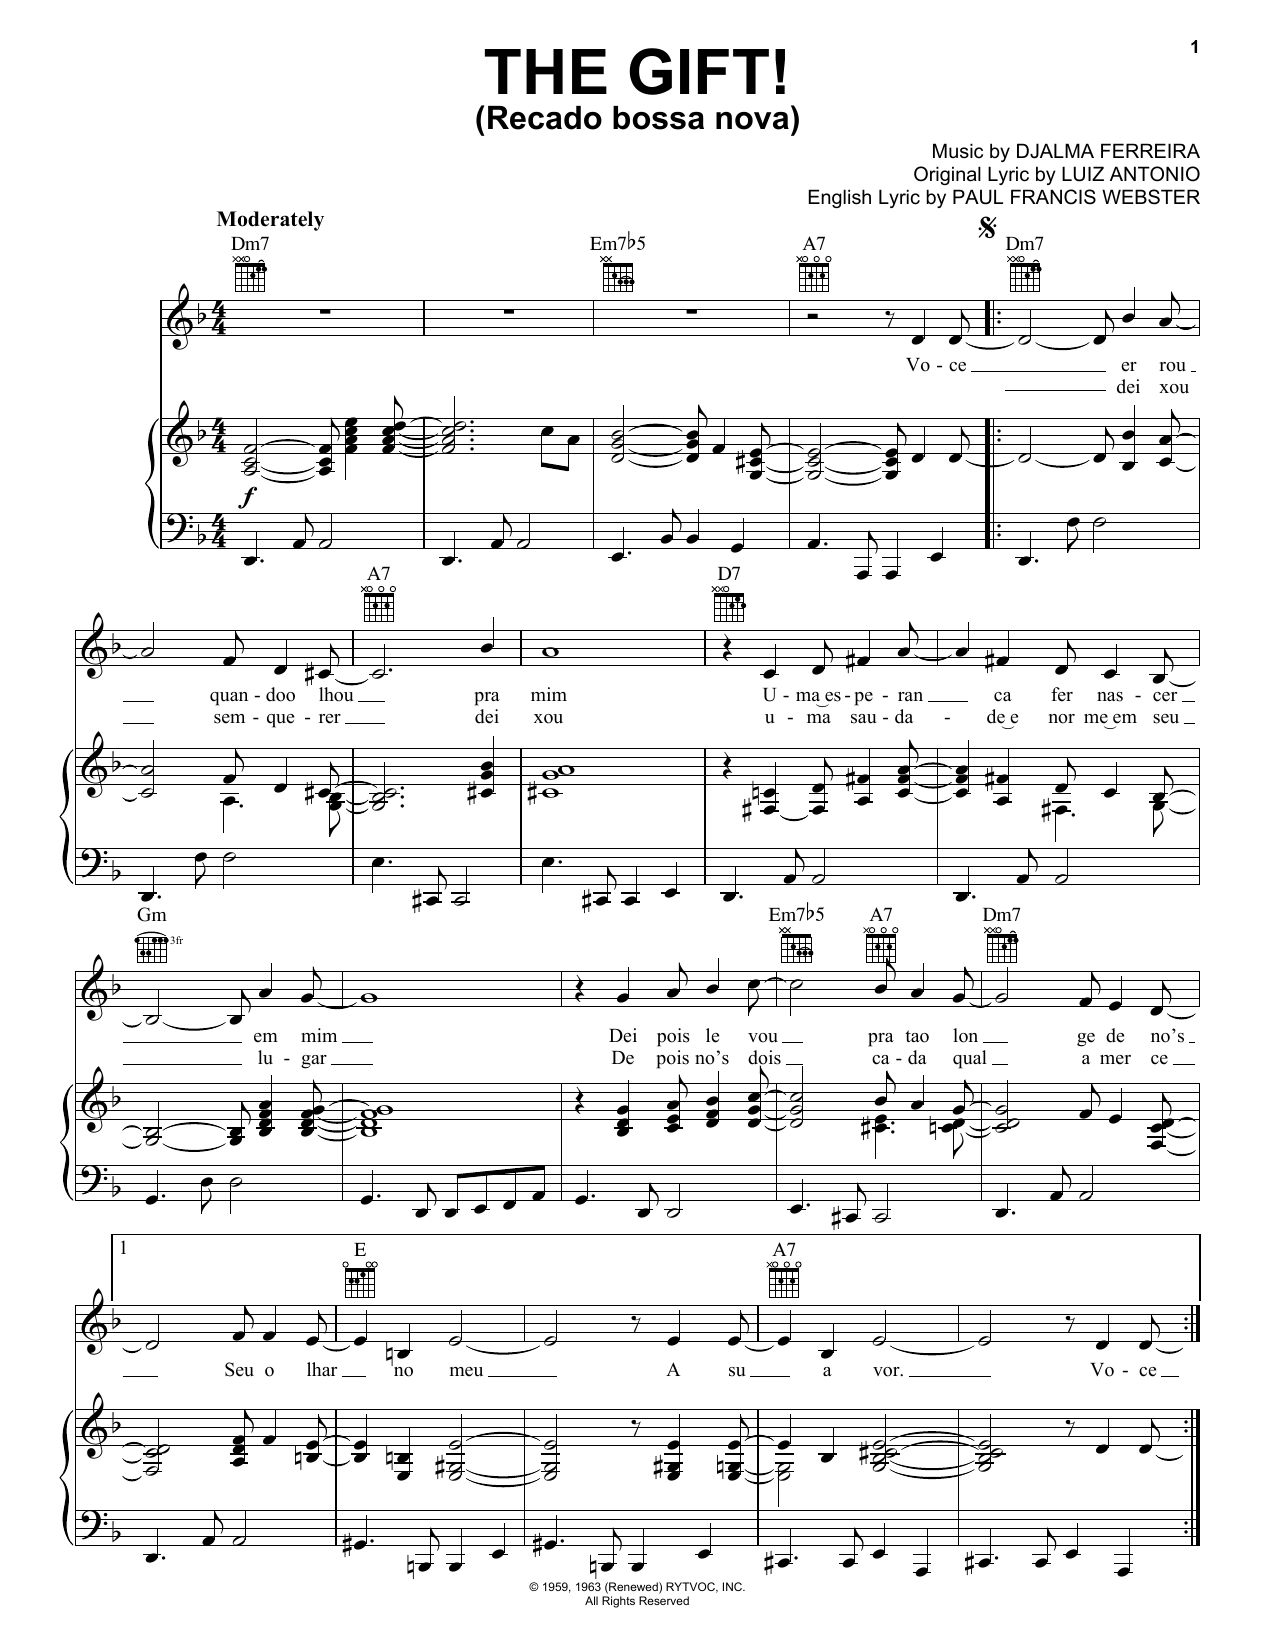 Luiz Antonio The Gift! (Recado Bossa Nova) sheet music notes and chords. Download Printable PDF.